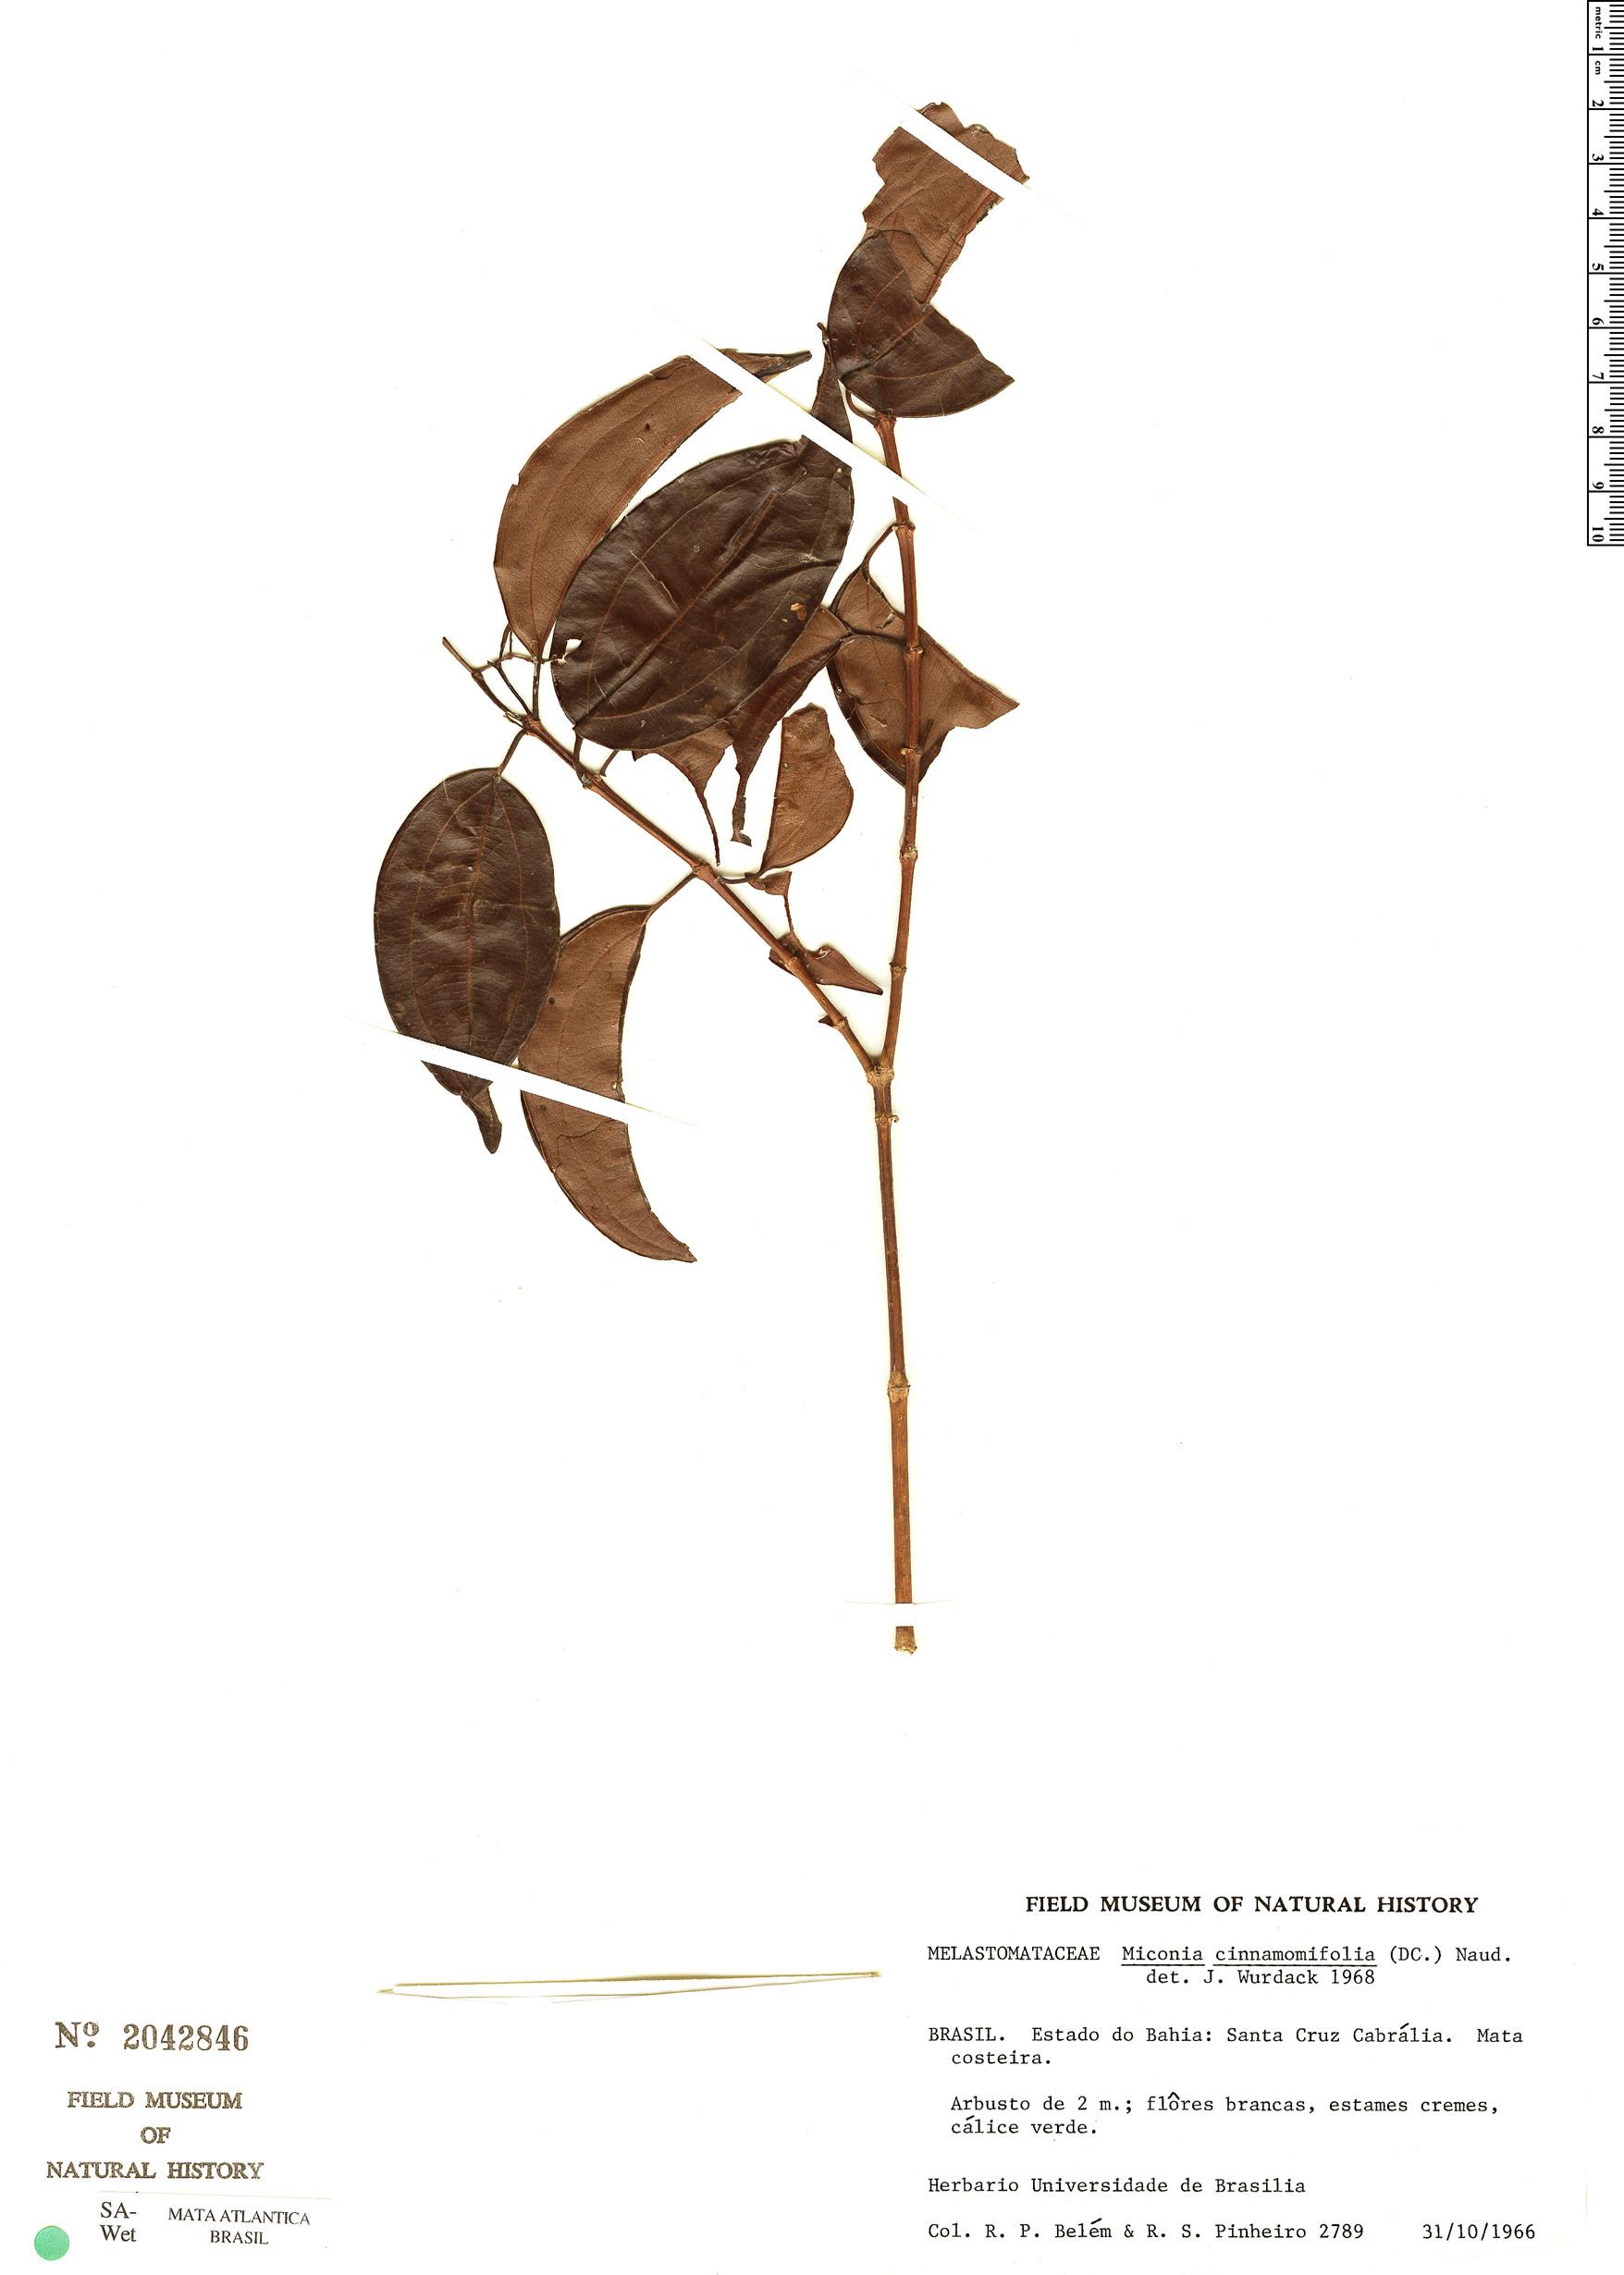 Specimen: Miconia cinnamomifolia